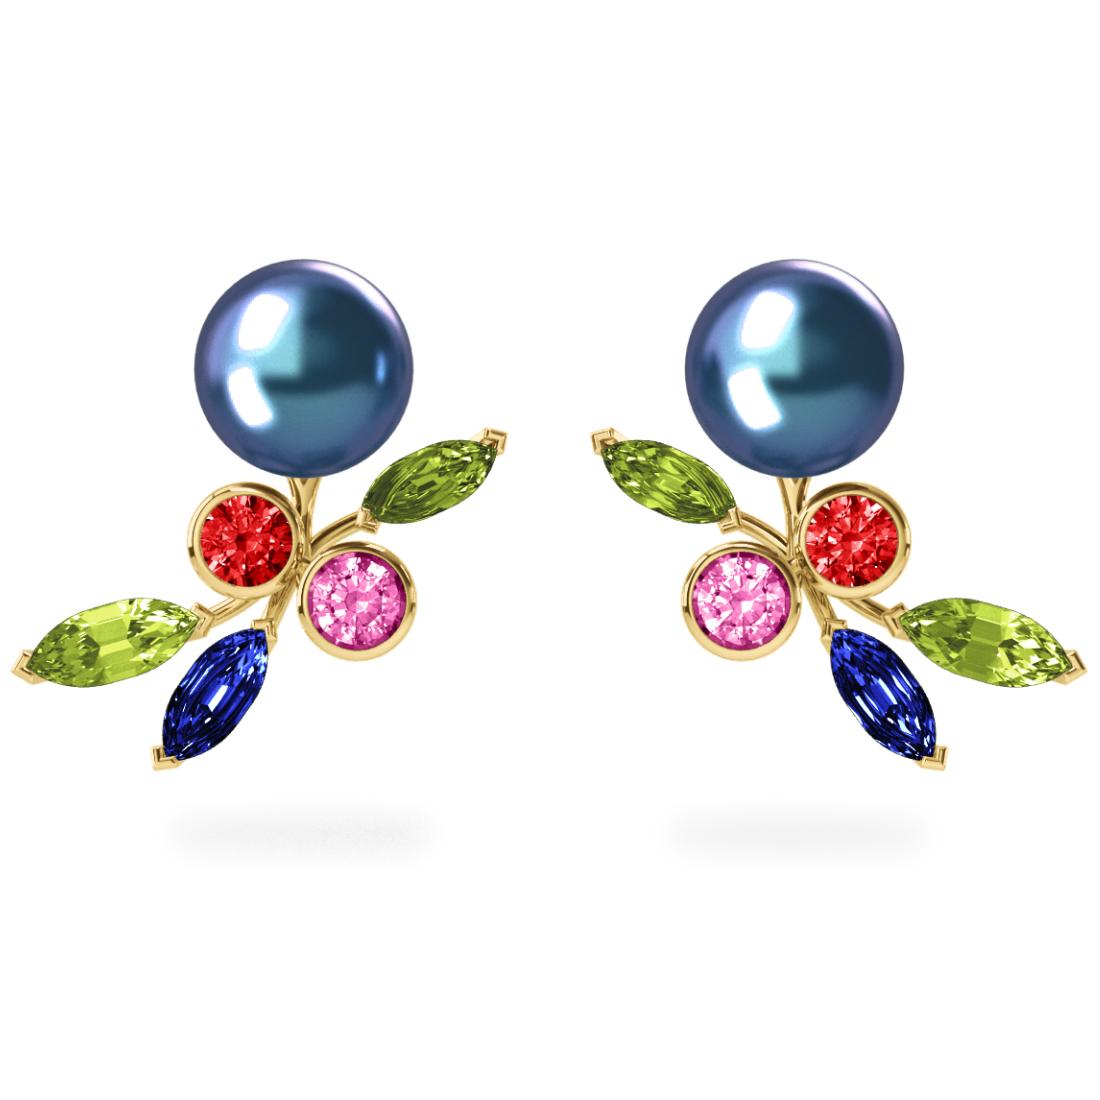 Boucles d'oreilles My Angel Peacock Céleste - Saphirs, diamants, peridots & perles de Tahiti <br /> Or jaune 18 carats